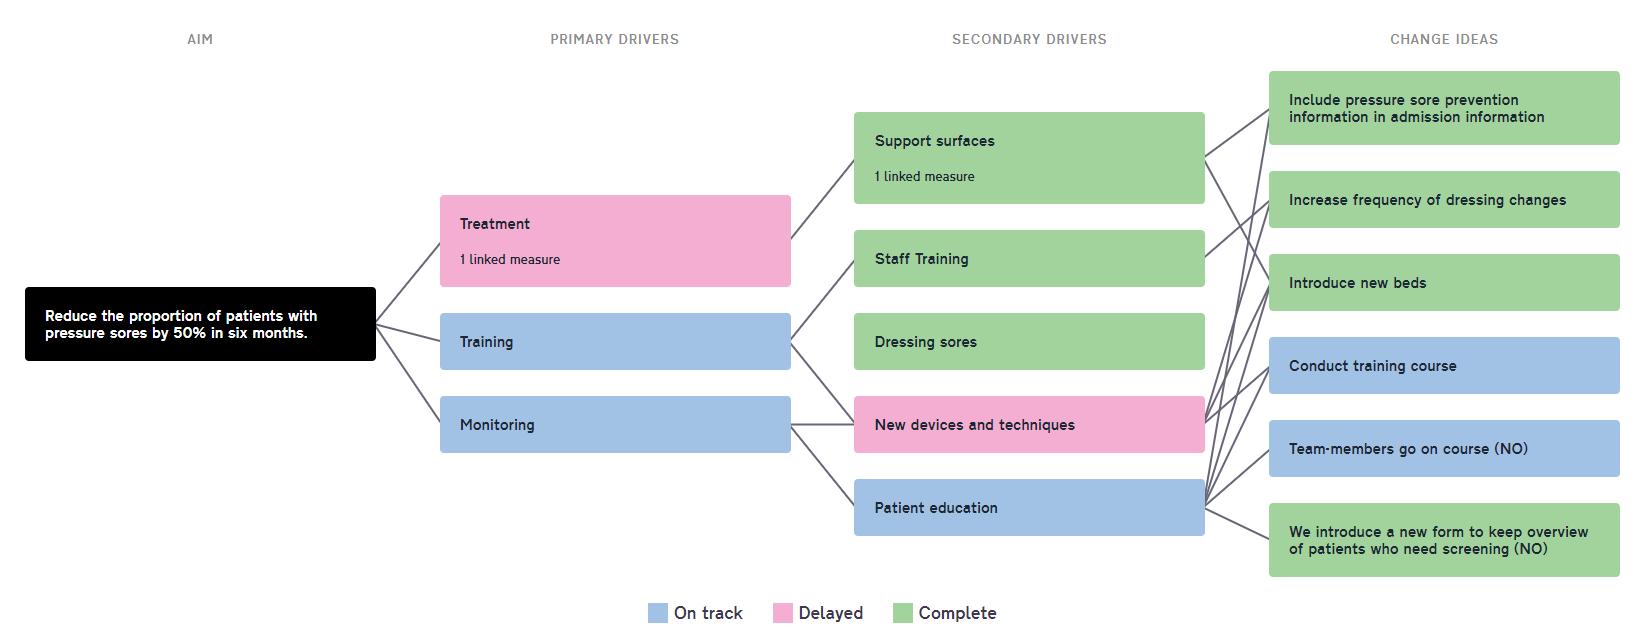 New Driver Diagram understanding driver diagrams